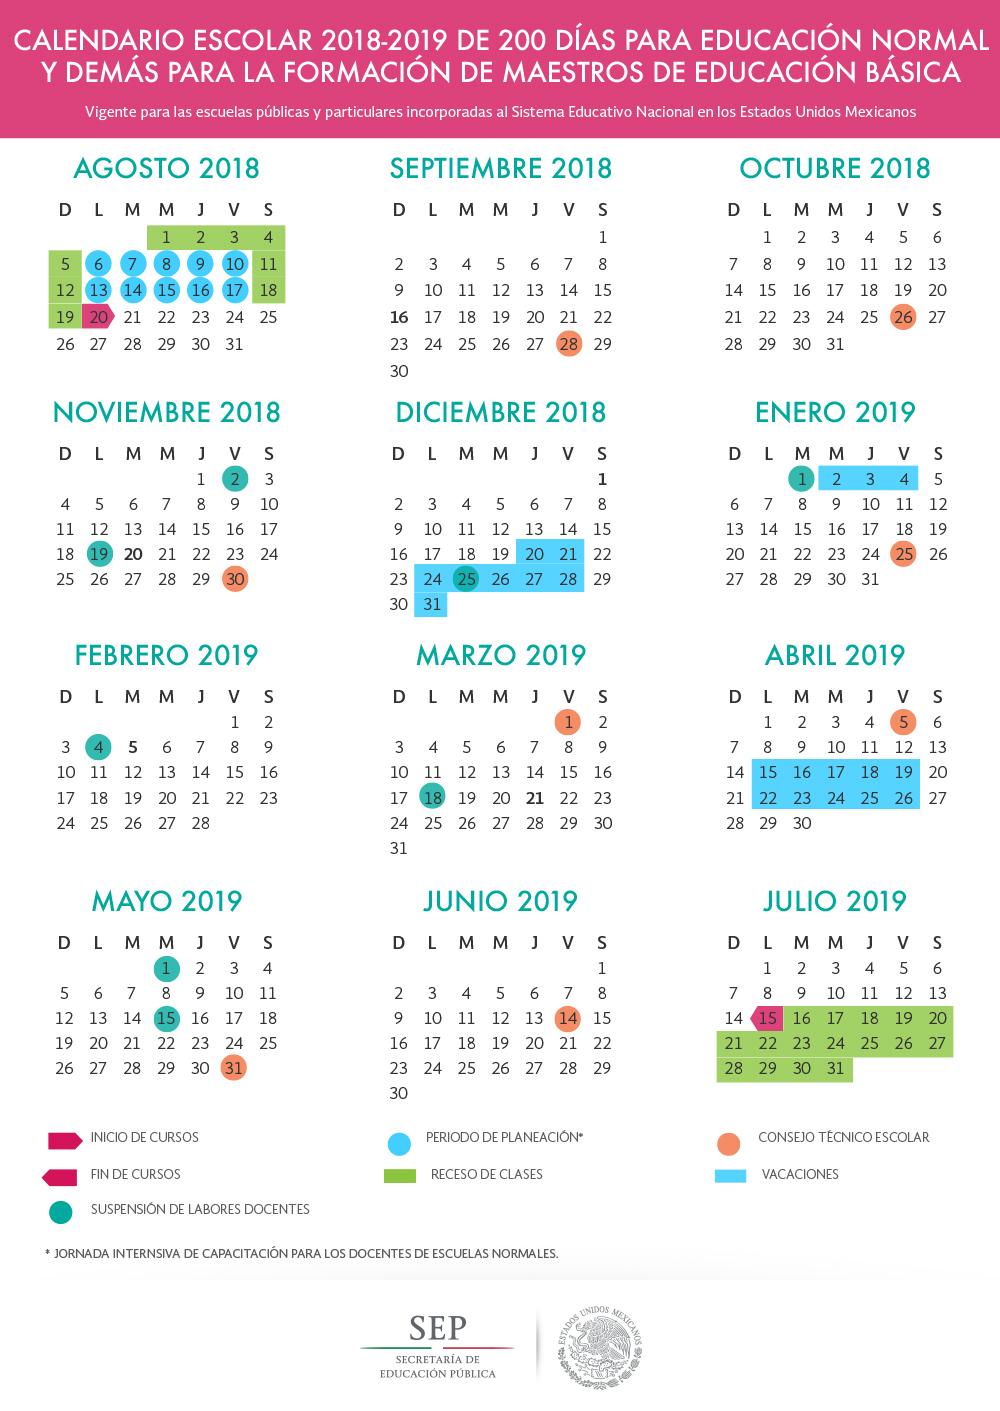 sep 2018-2019 descansos escolares, educación básica